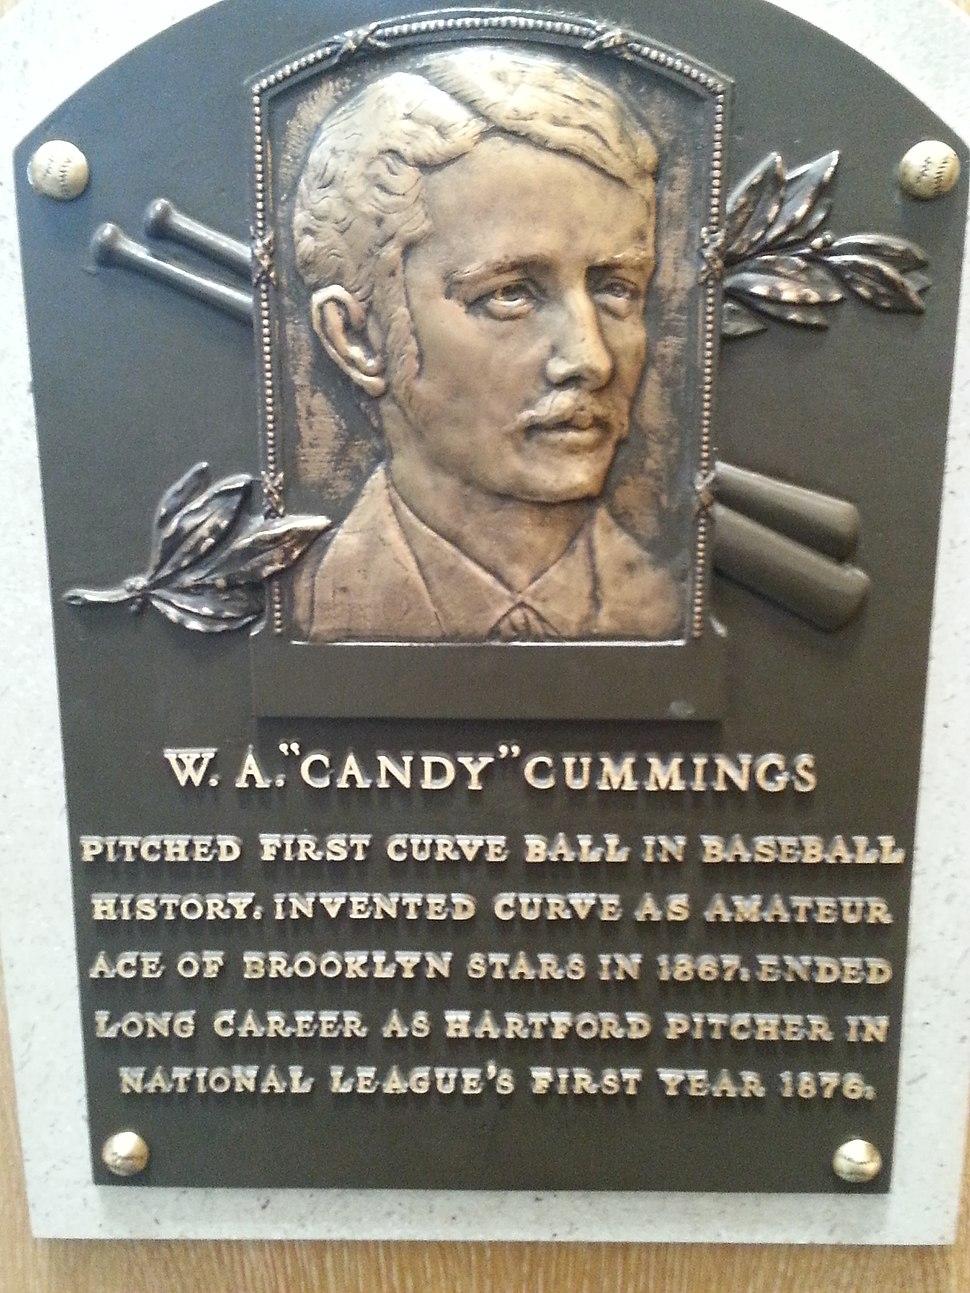 Candy Cummings plaque